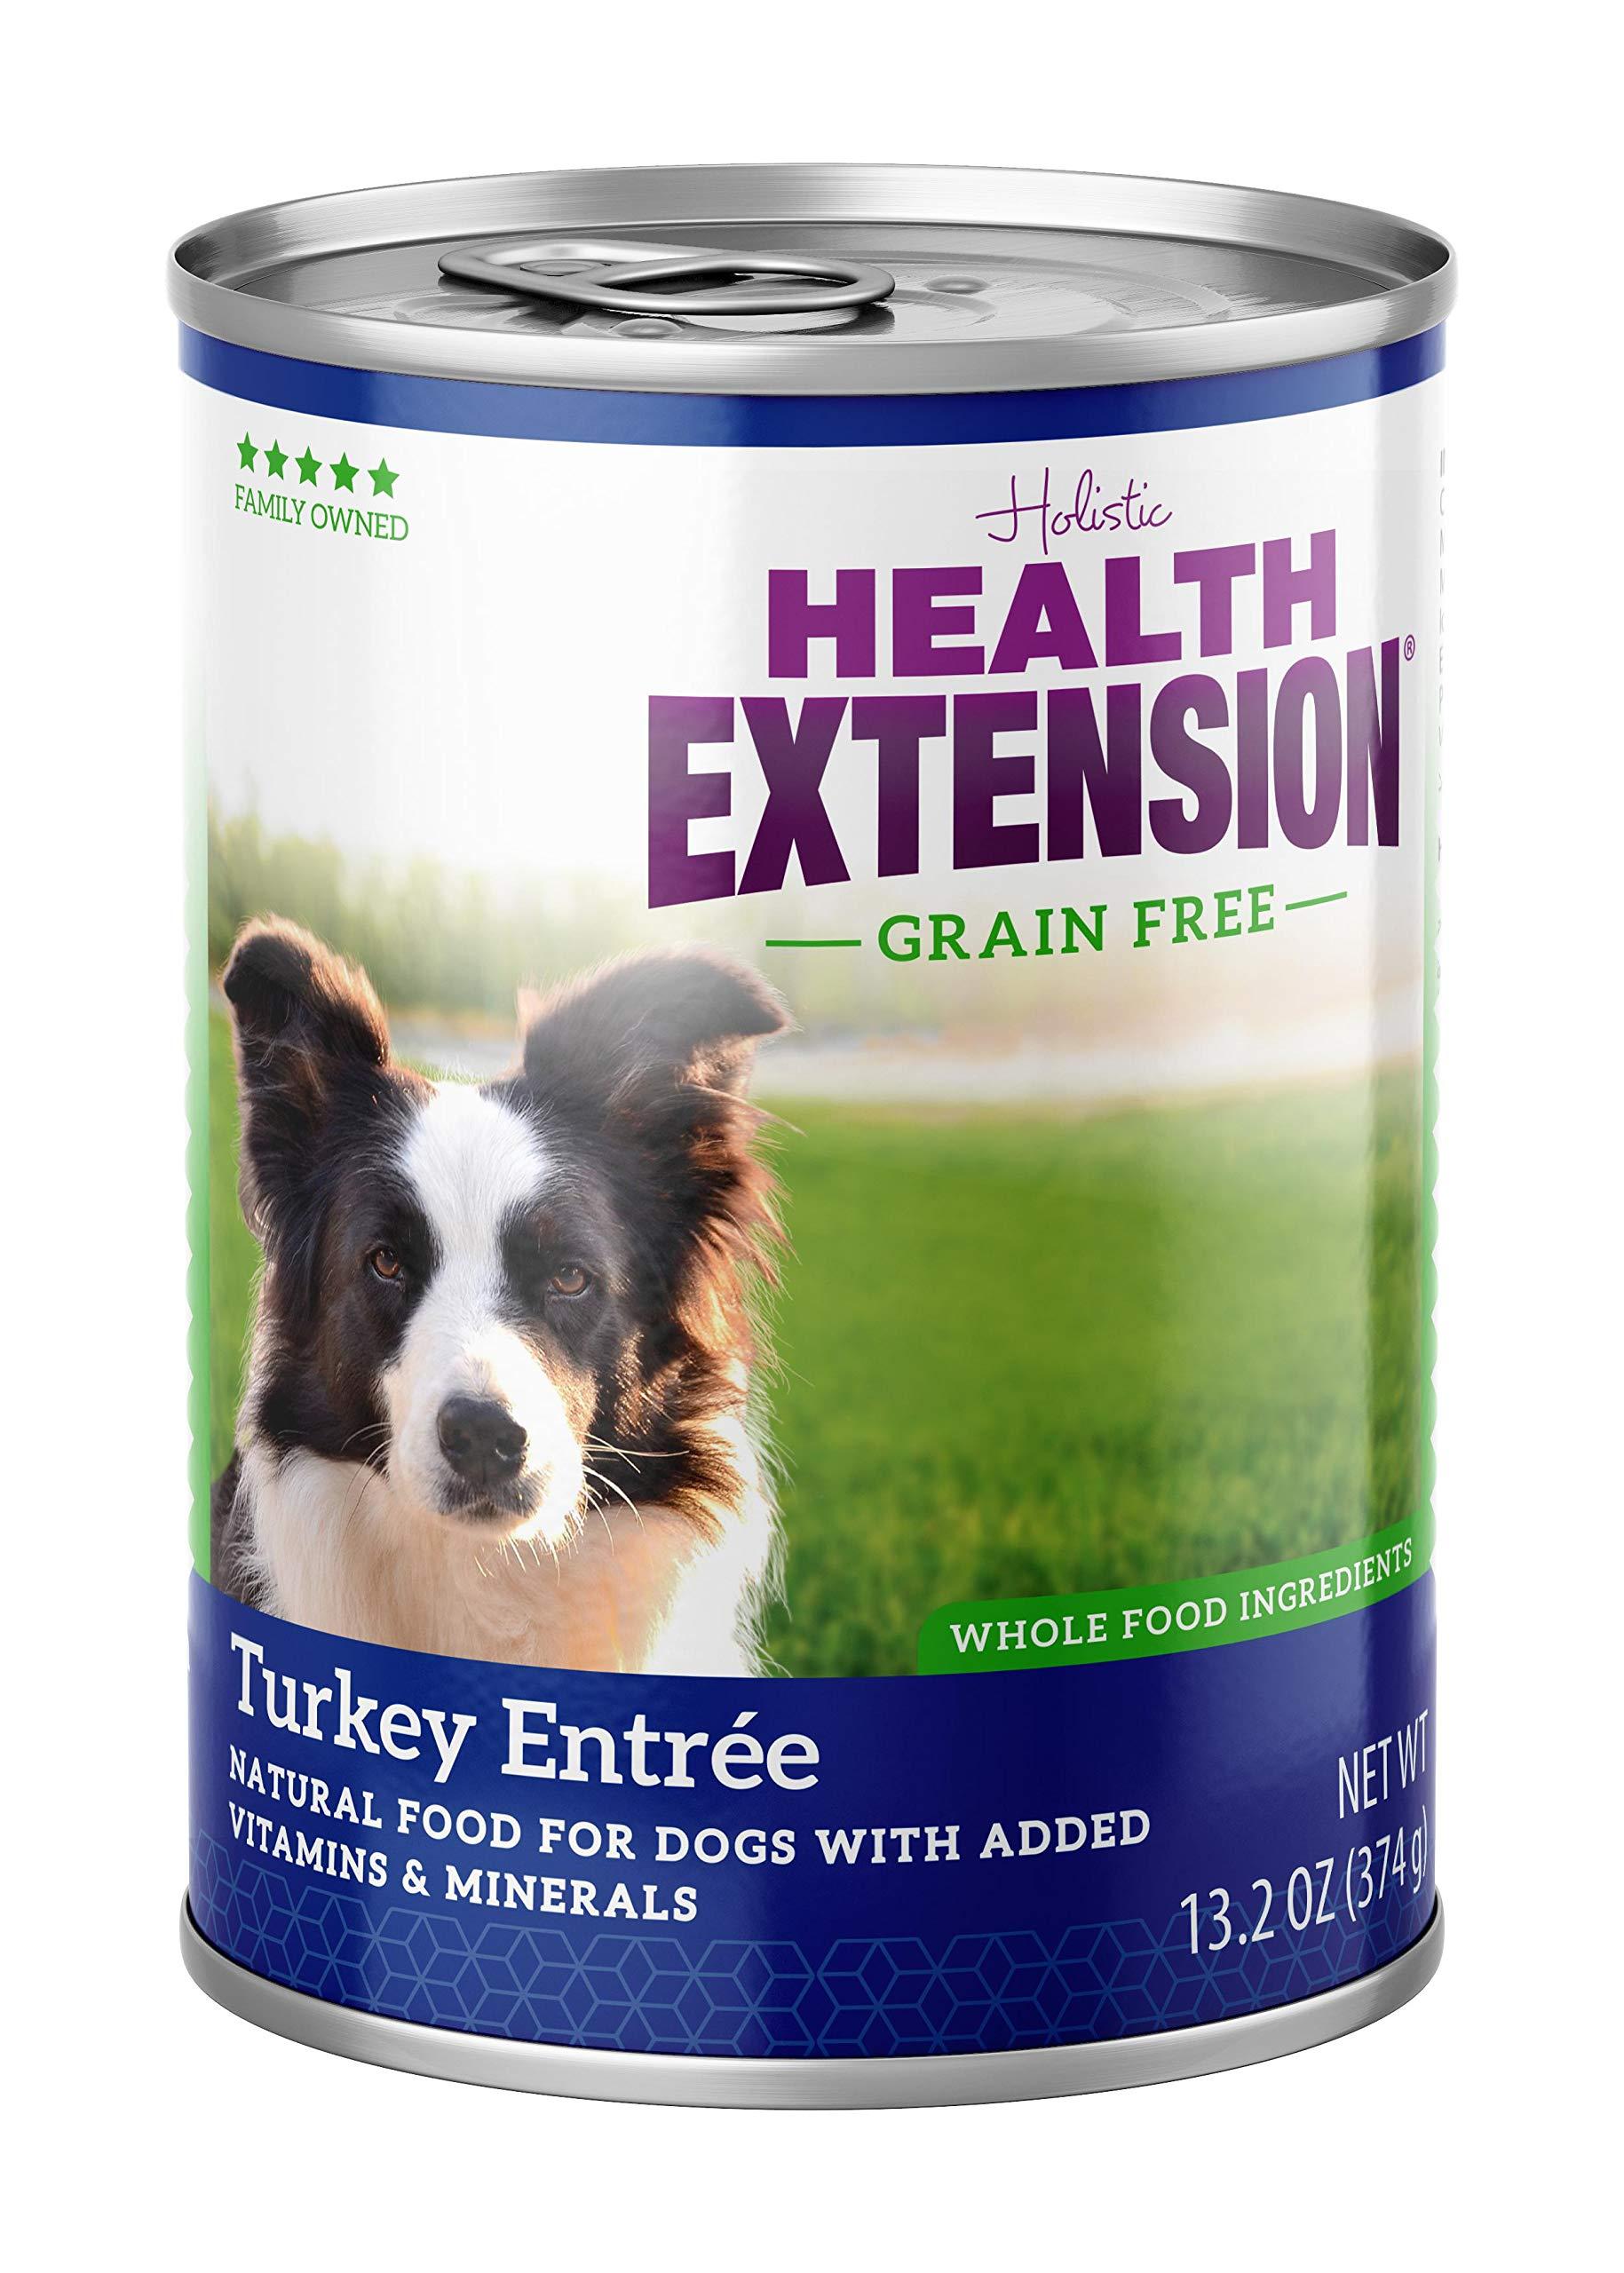 Health Extension Grain Free Turkey Entree 13.2-Ounces, Case Of 12